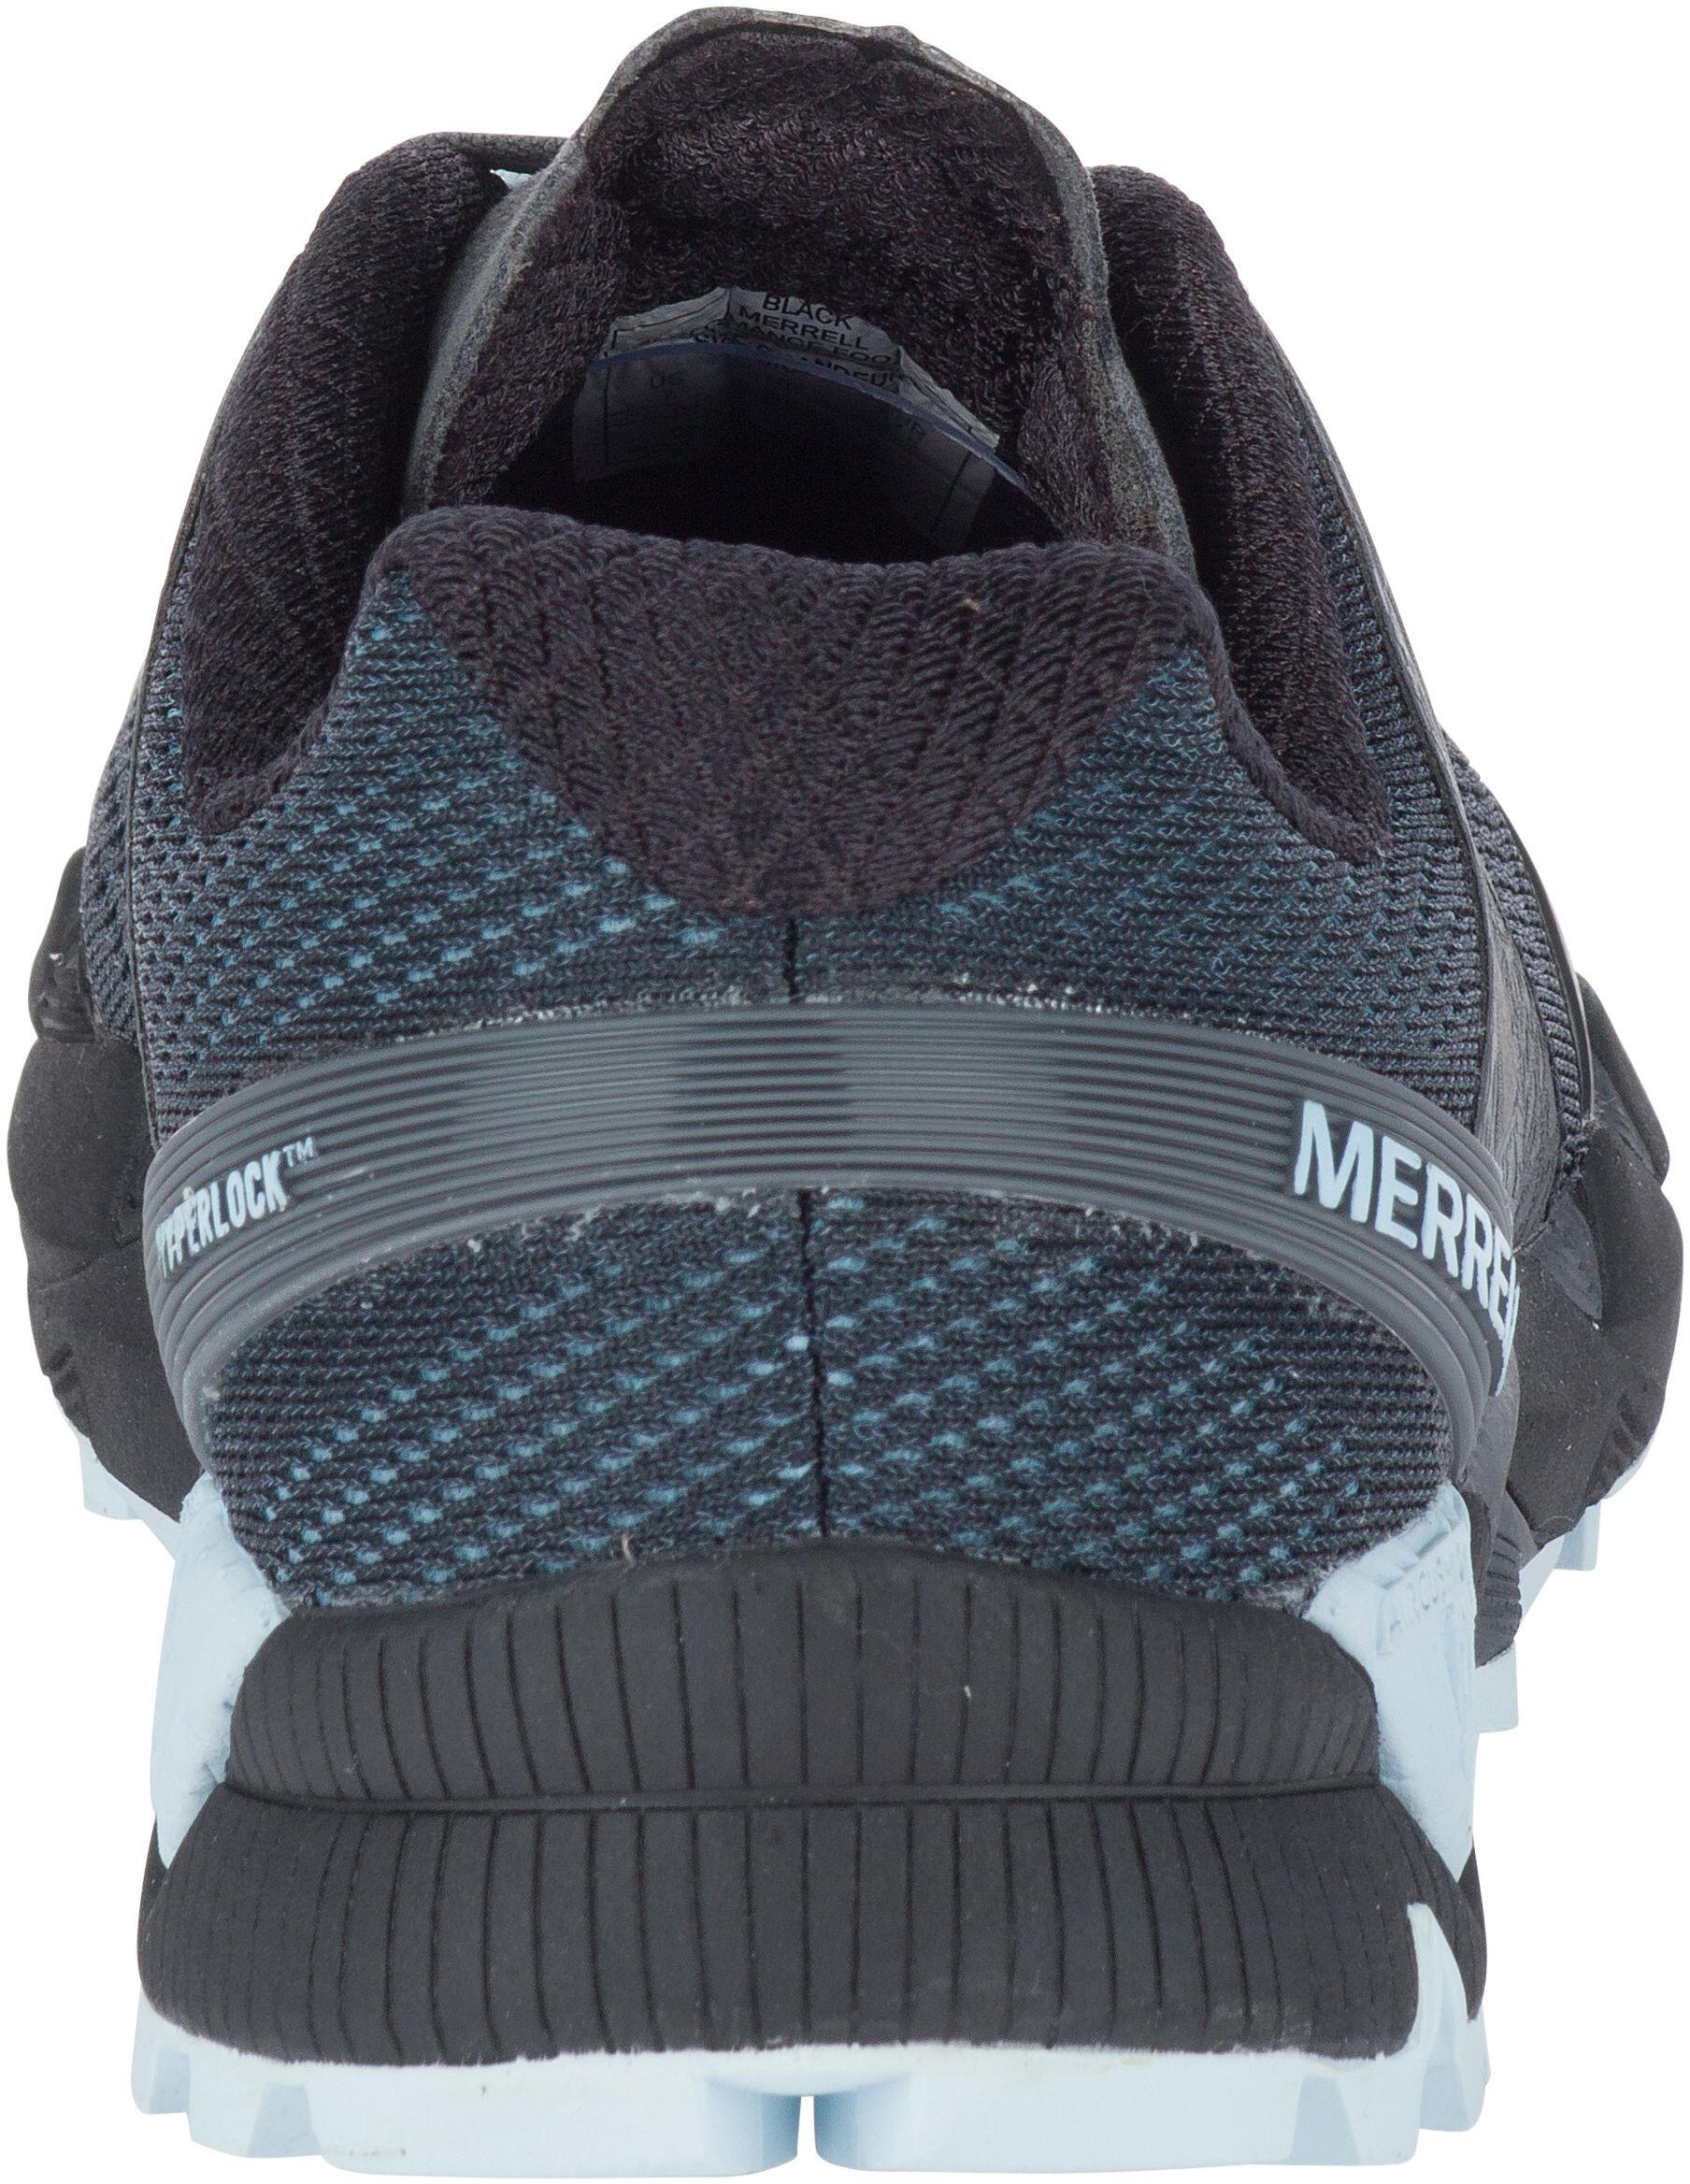 Merrell Agility Peak Flex 2 E-Mesh Löparskor Dam grå svart - till ... 739c8bce87575